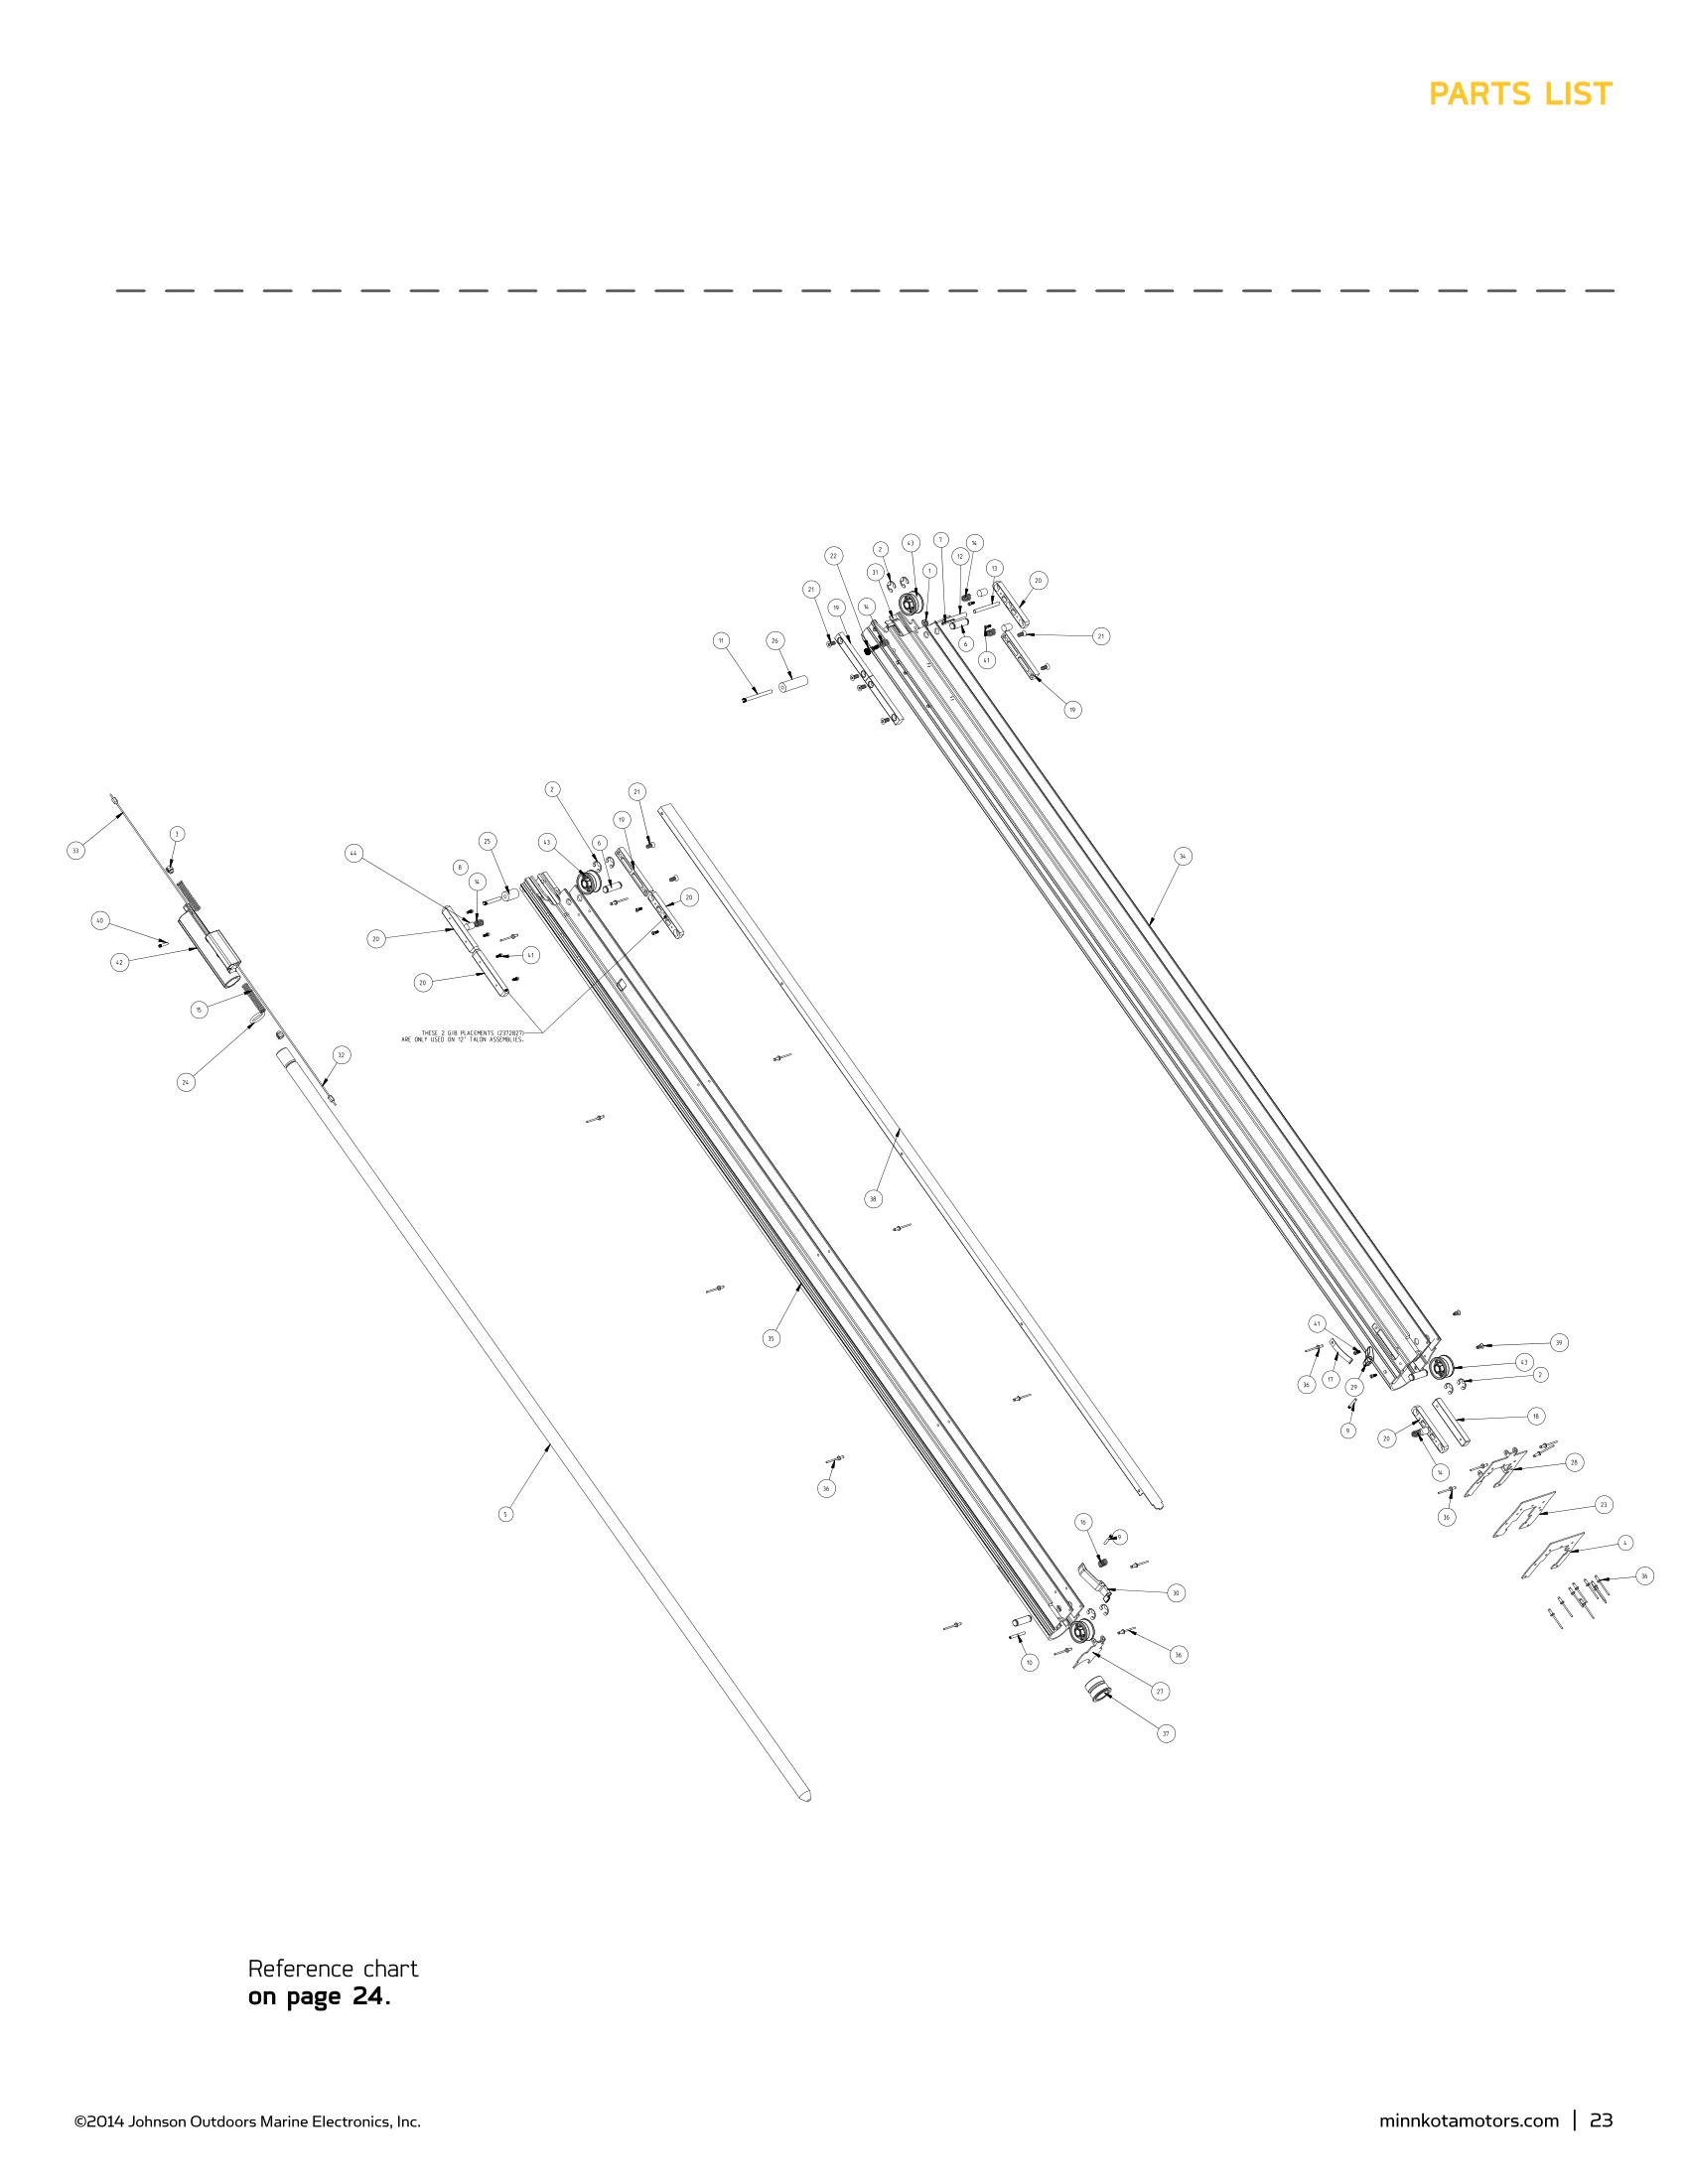 [DIAGRAM in Pictures Database] Minn Kota Talon Wiring